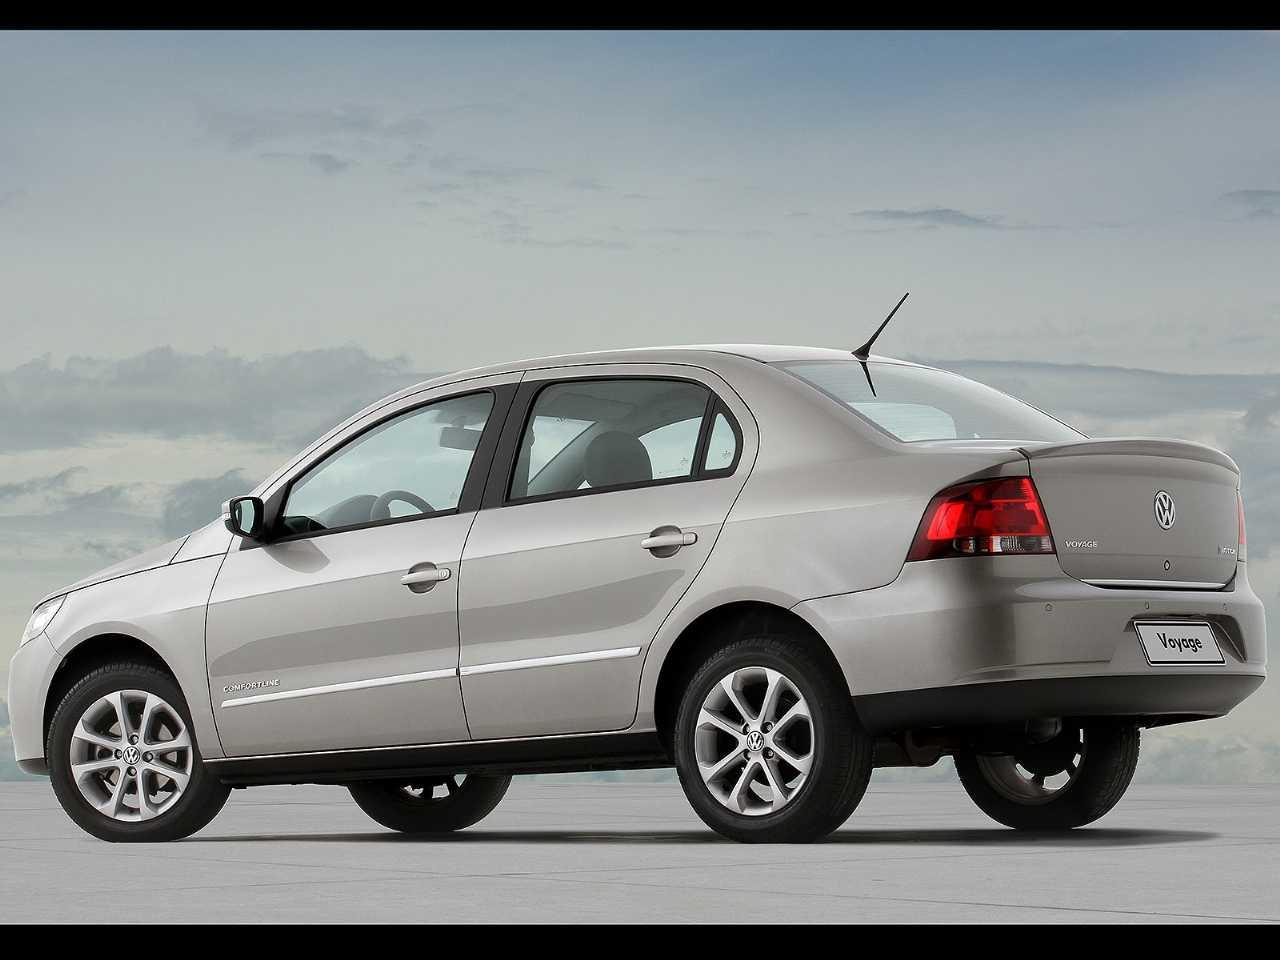 VolkswagenVoyage 2012 - ângulo traseiro